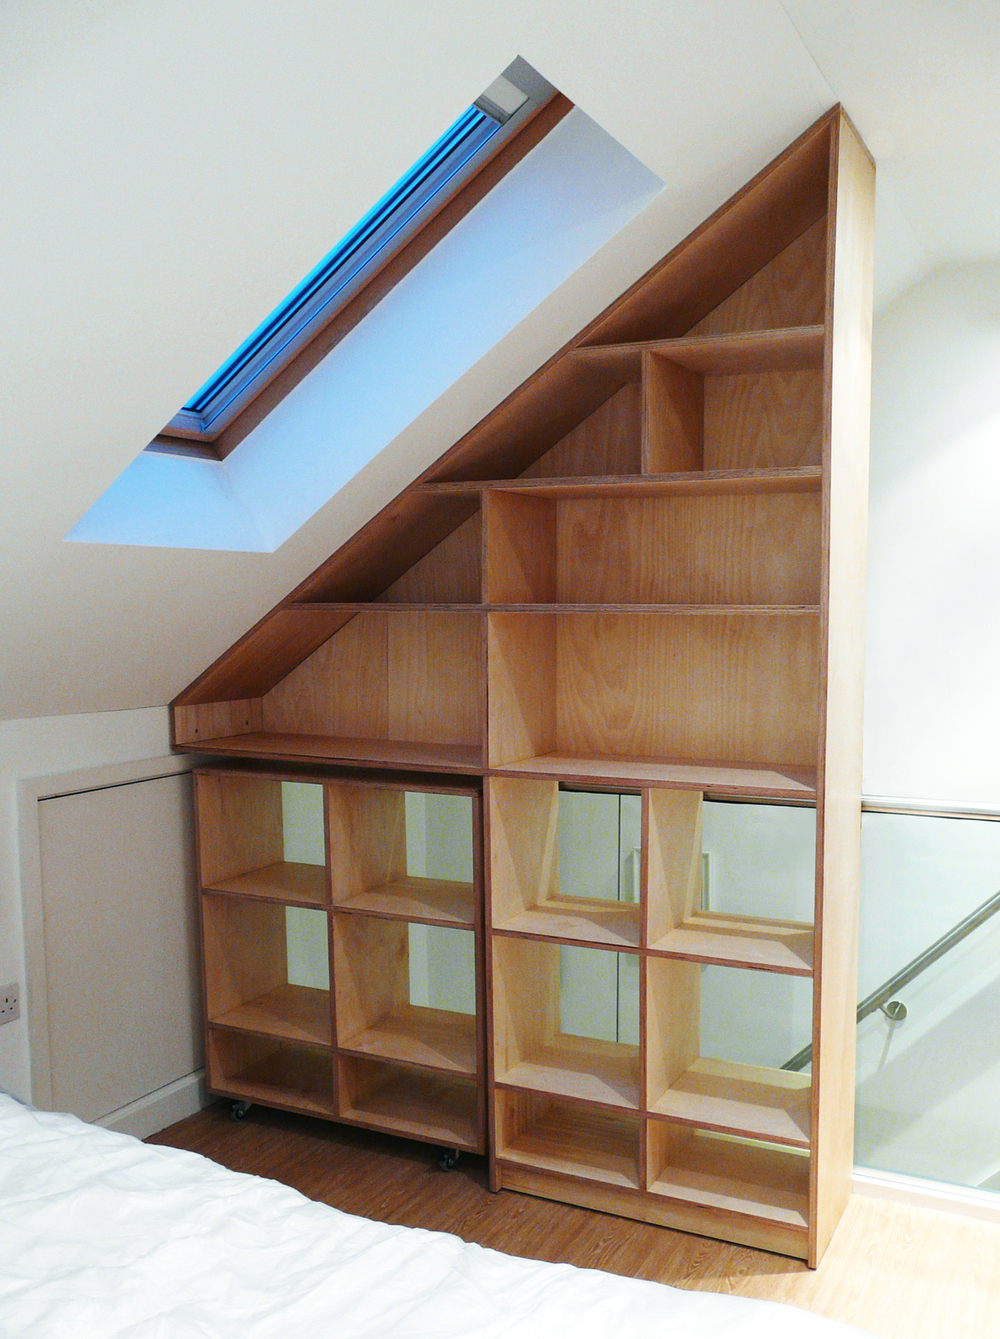 'Wedge' loft room shelving birch plywood 2.jpg